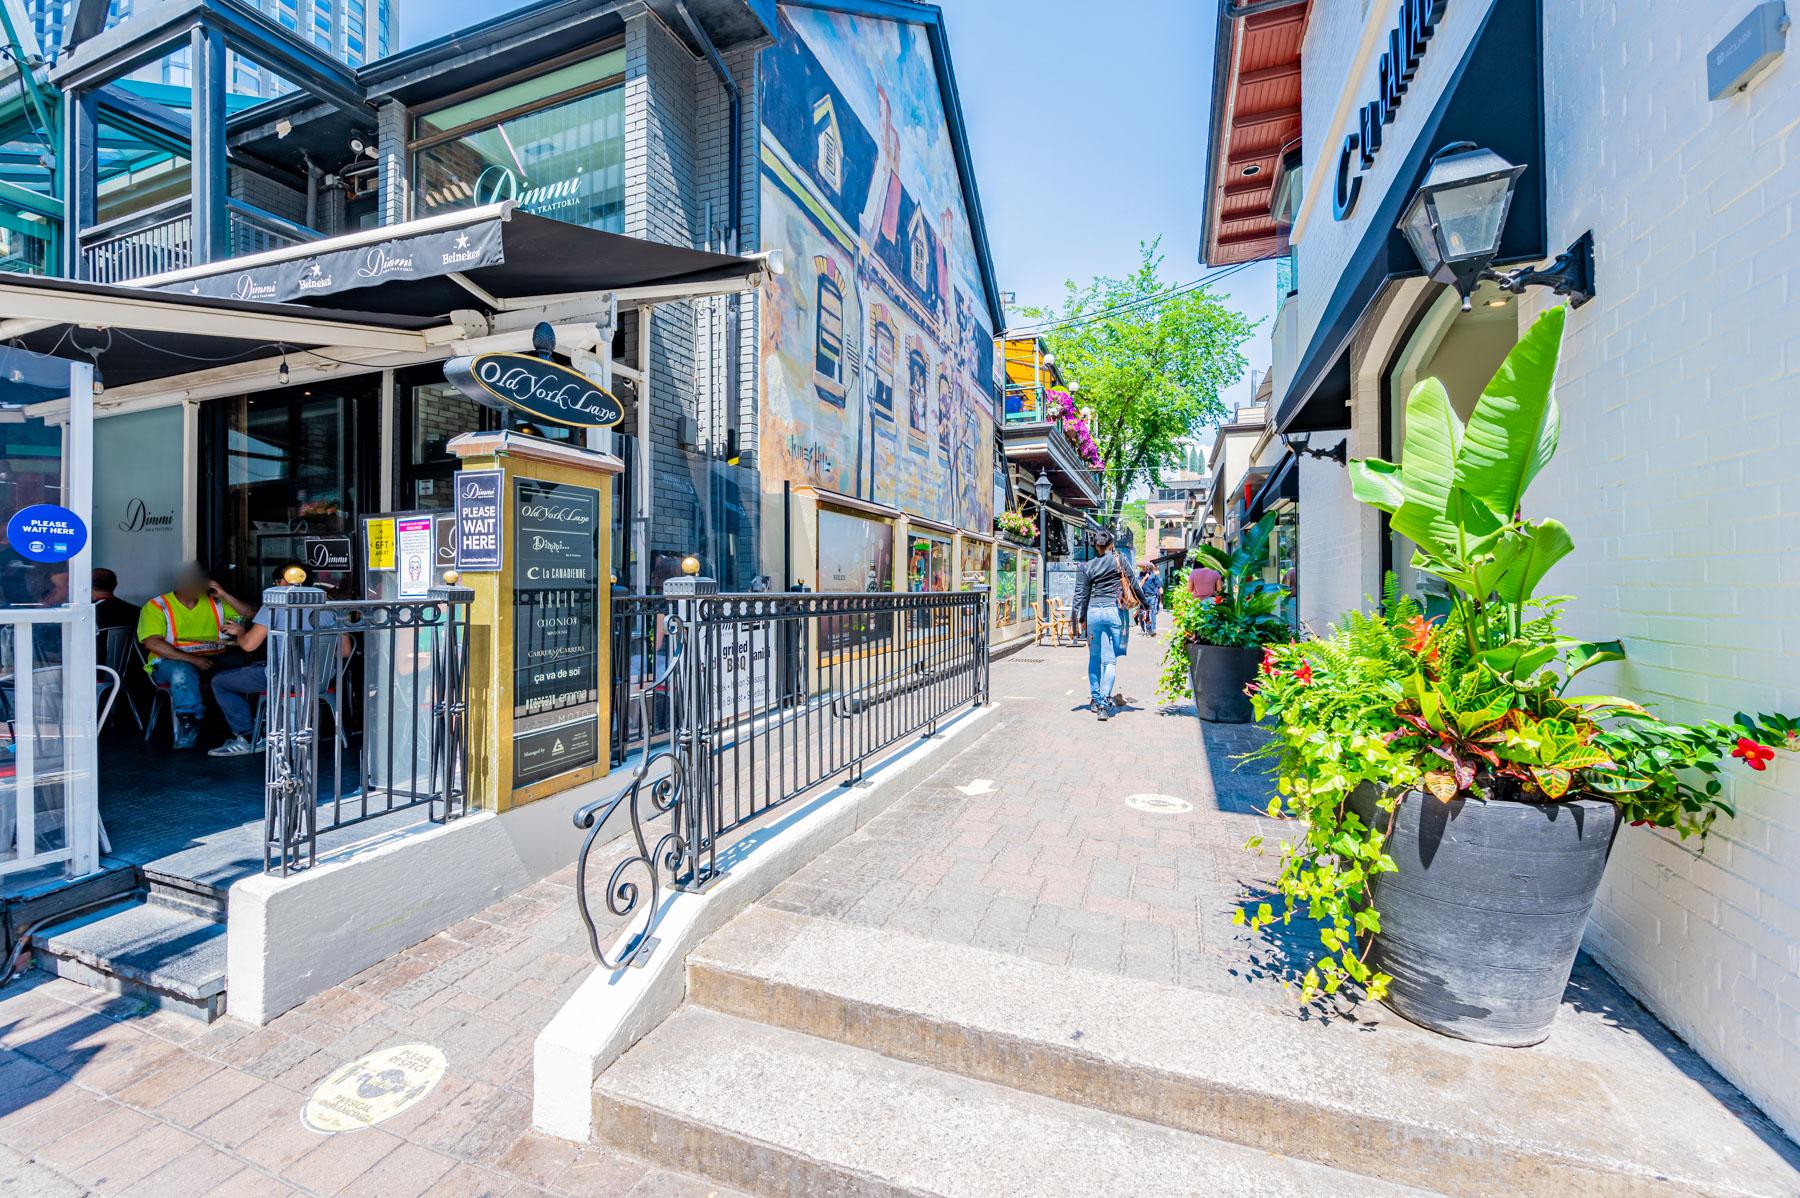 Restaurants and patios in Yorkville, Toronto.